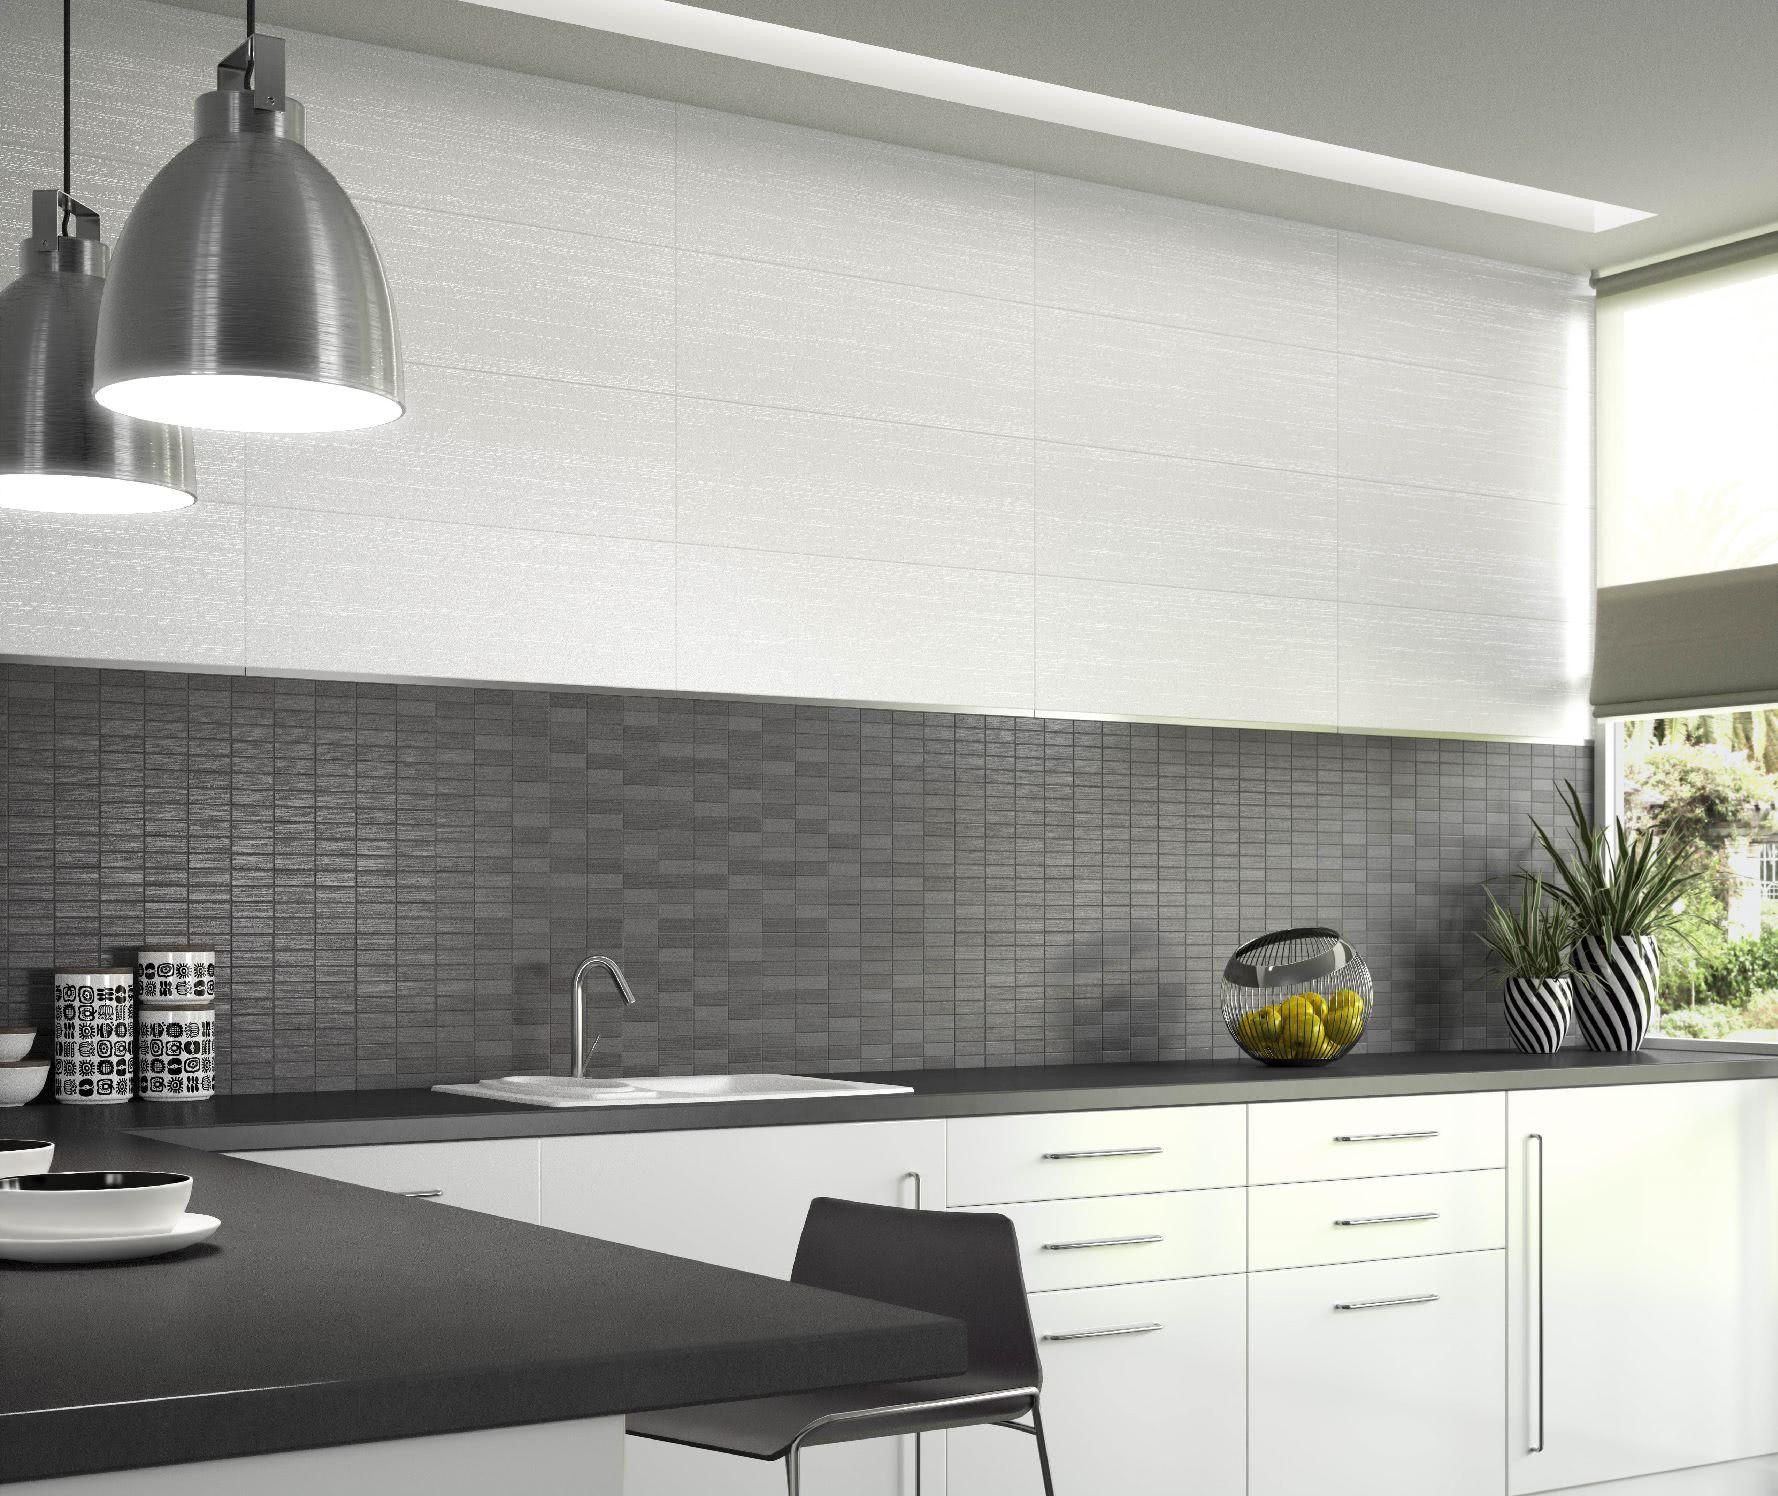 Aparadores c modas y chiffoniers acana interiorismo for Pavimentos para cocinas